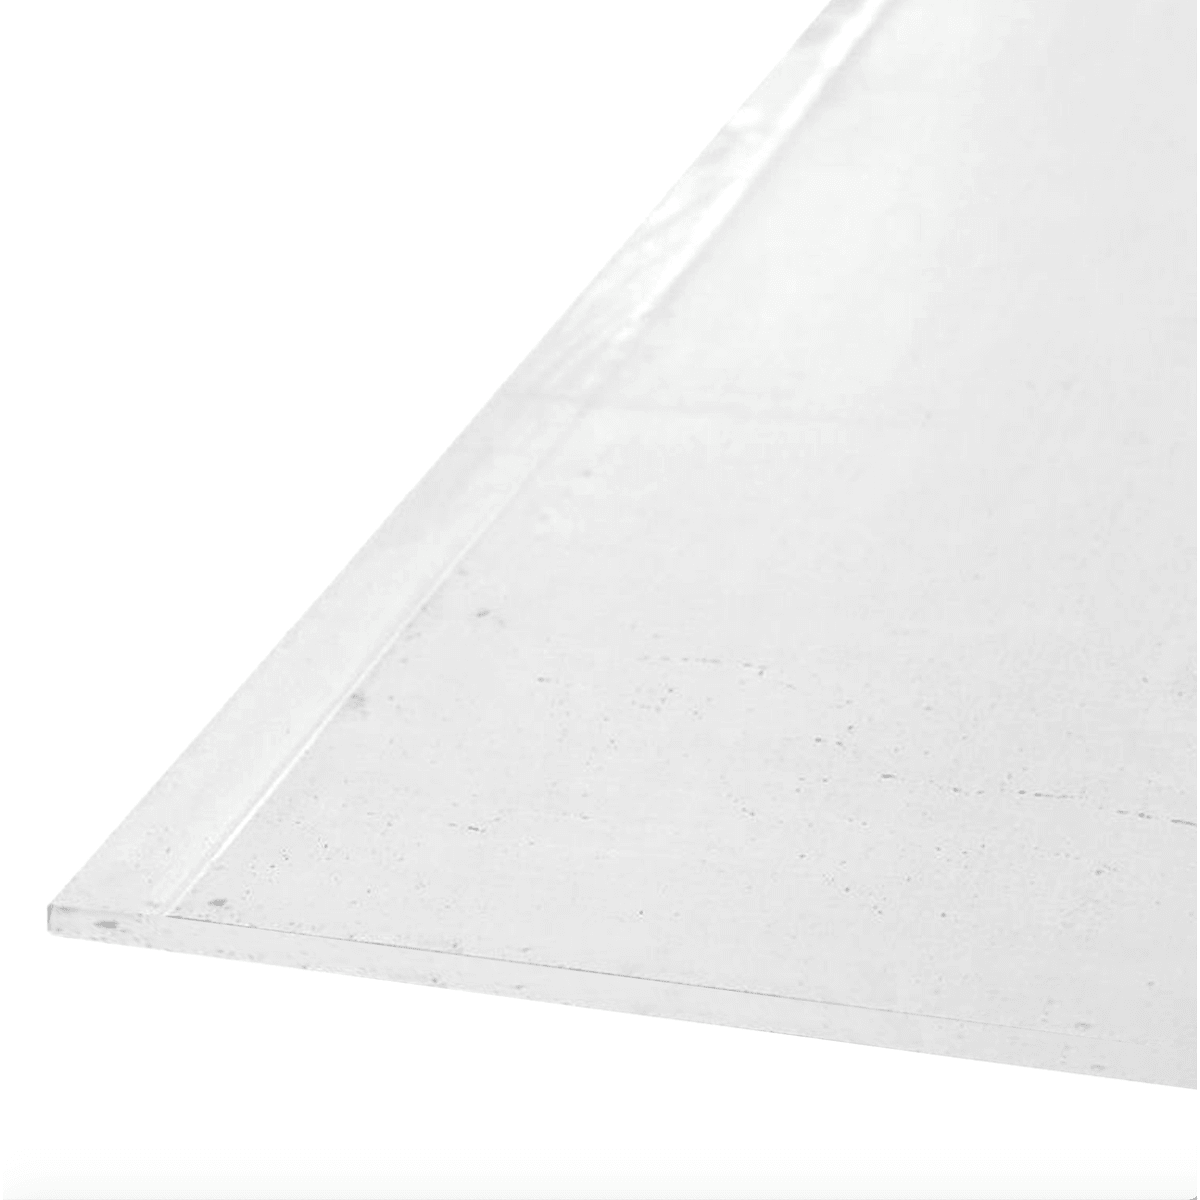 Лист стекломагниевый Magelan Стандарт 2440x1220x8 мм